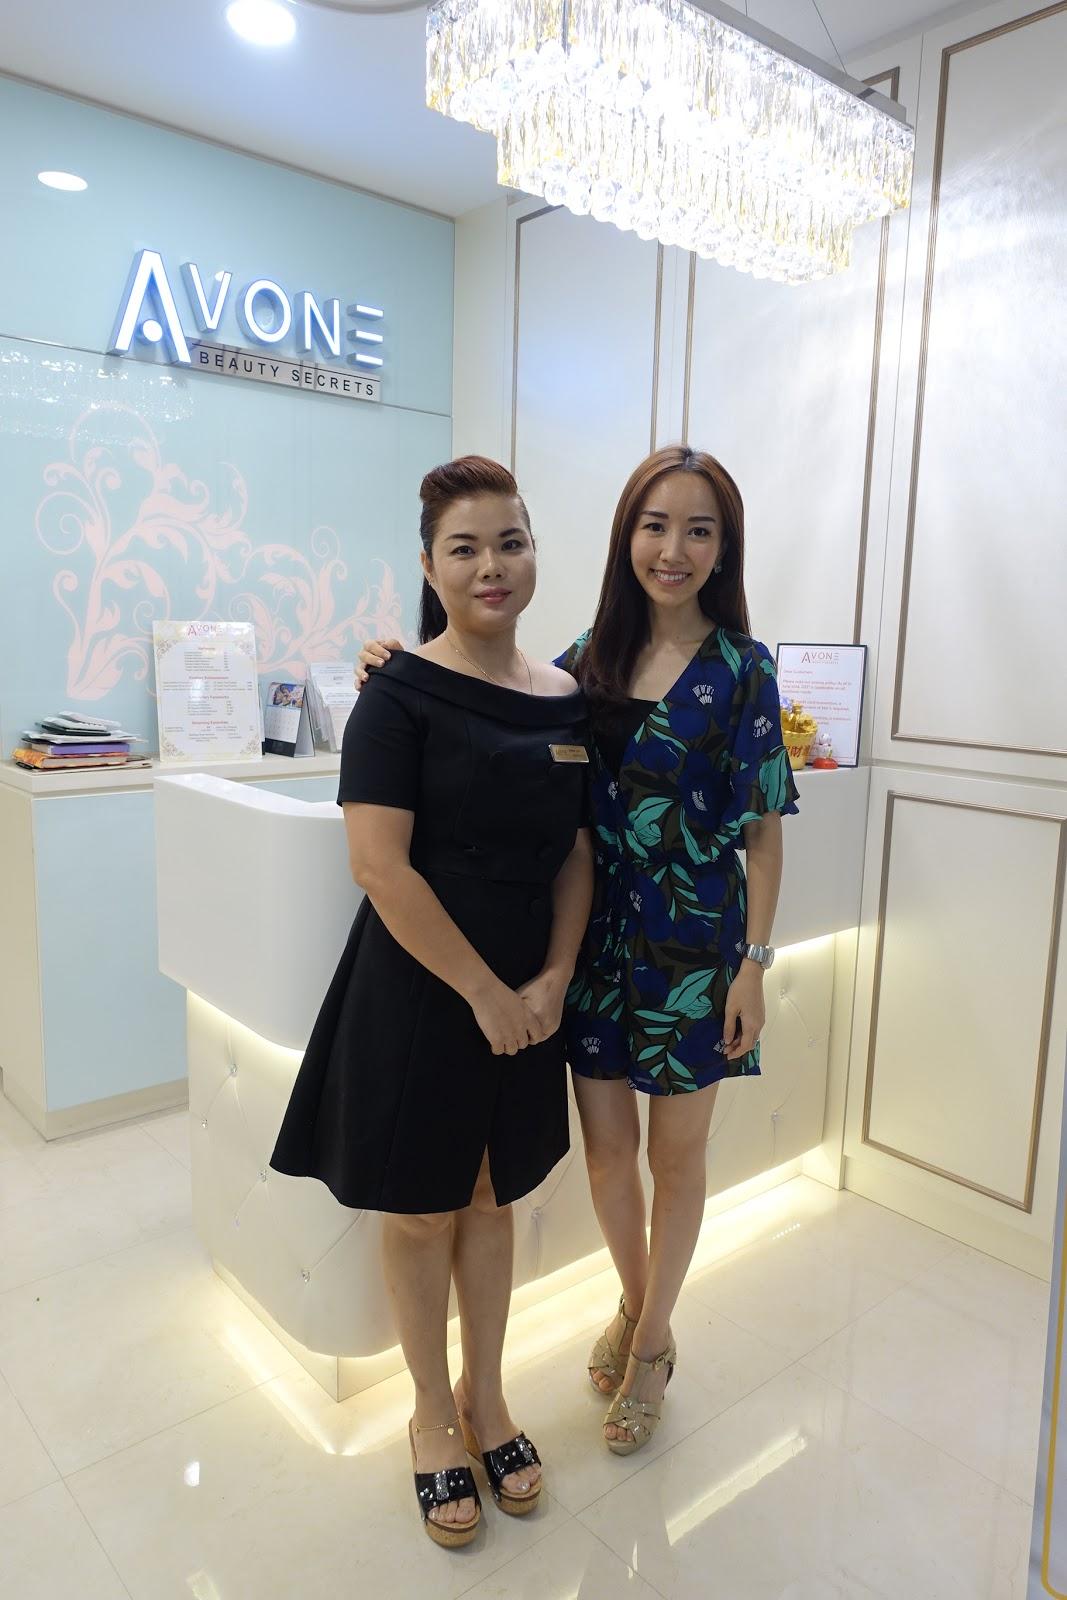 Avone Beauty Secrets 9V Ultimate Virtual Brows Embroidery